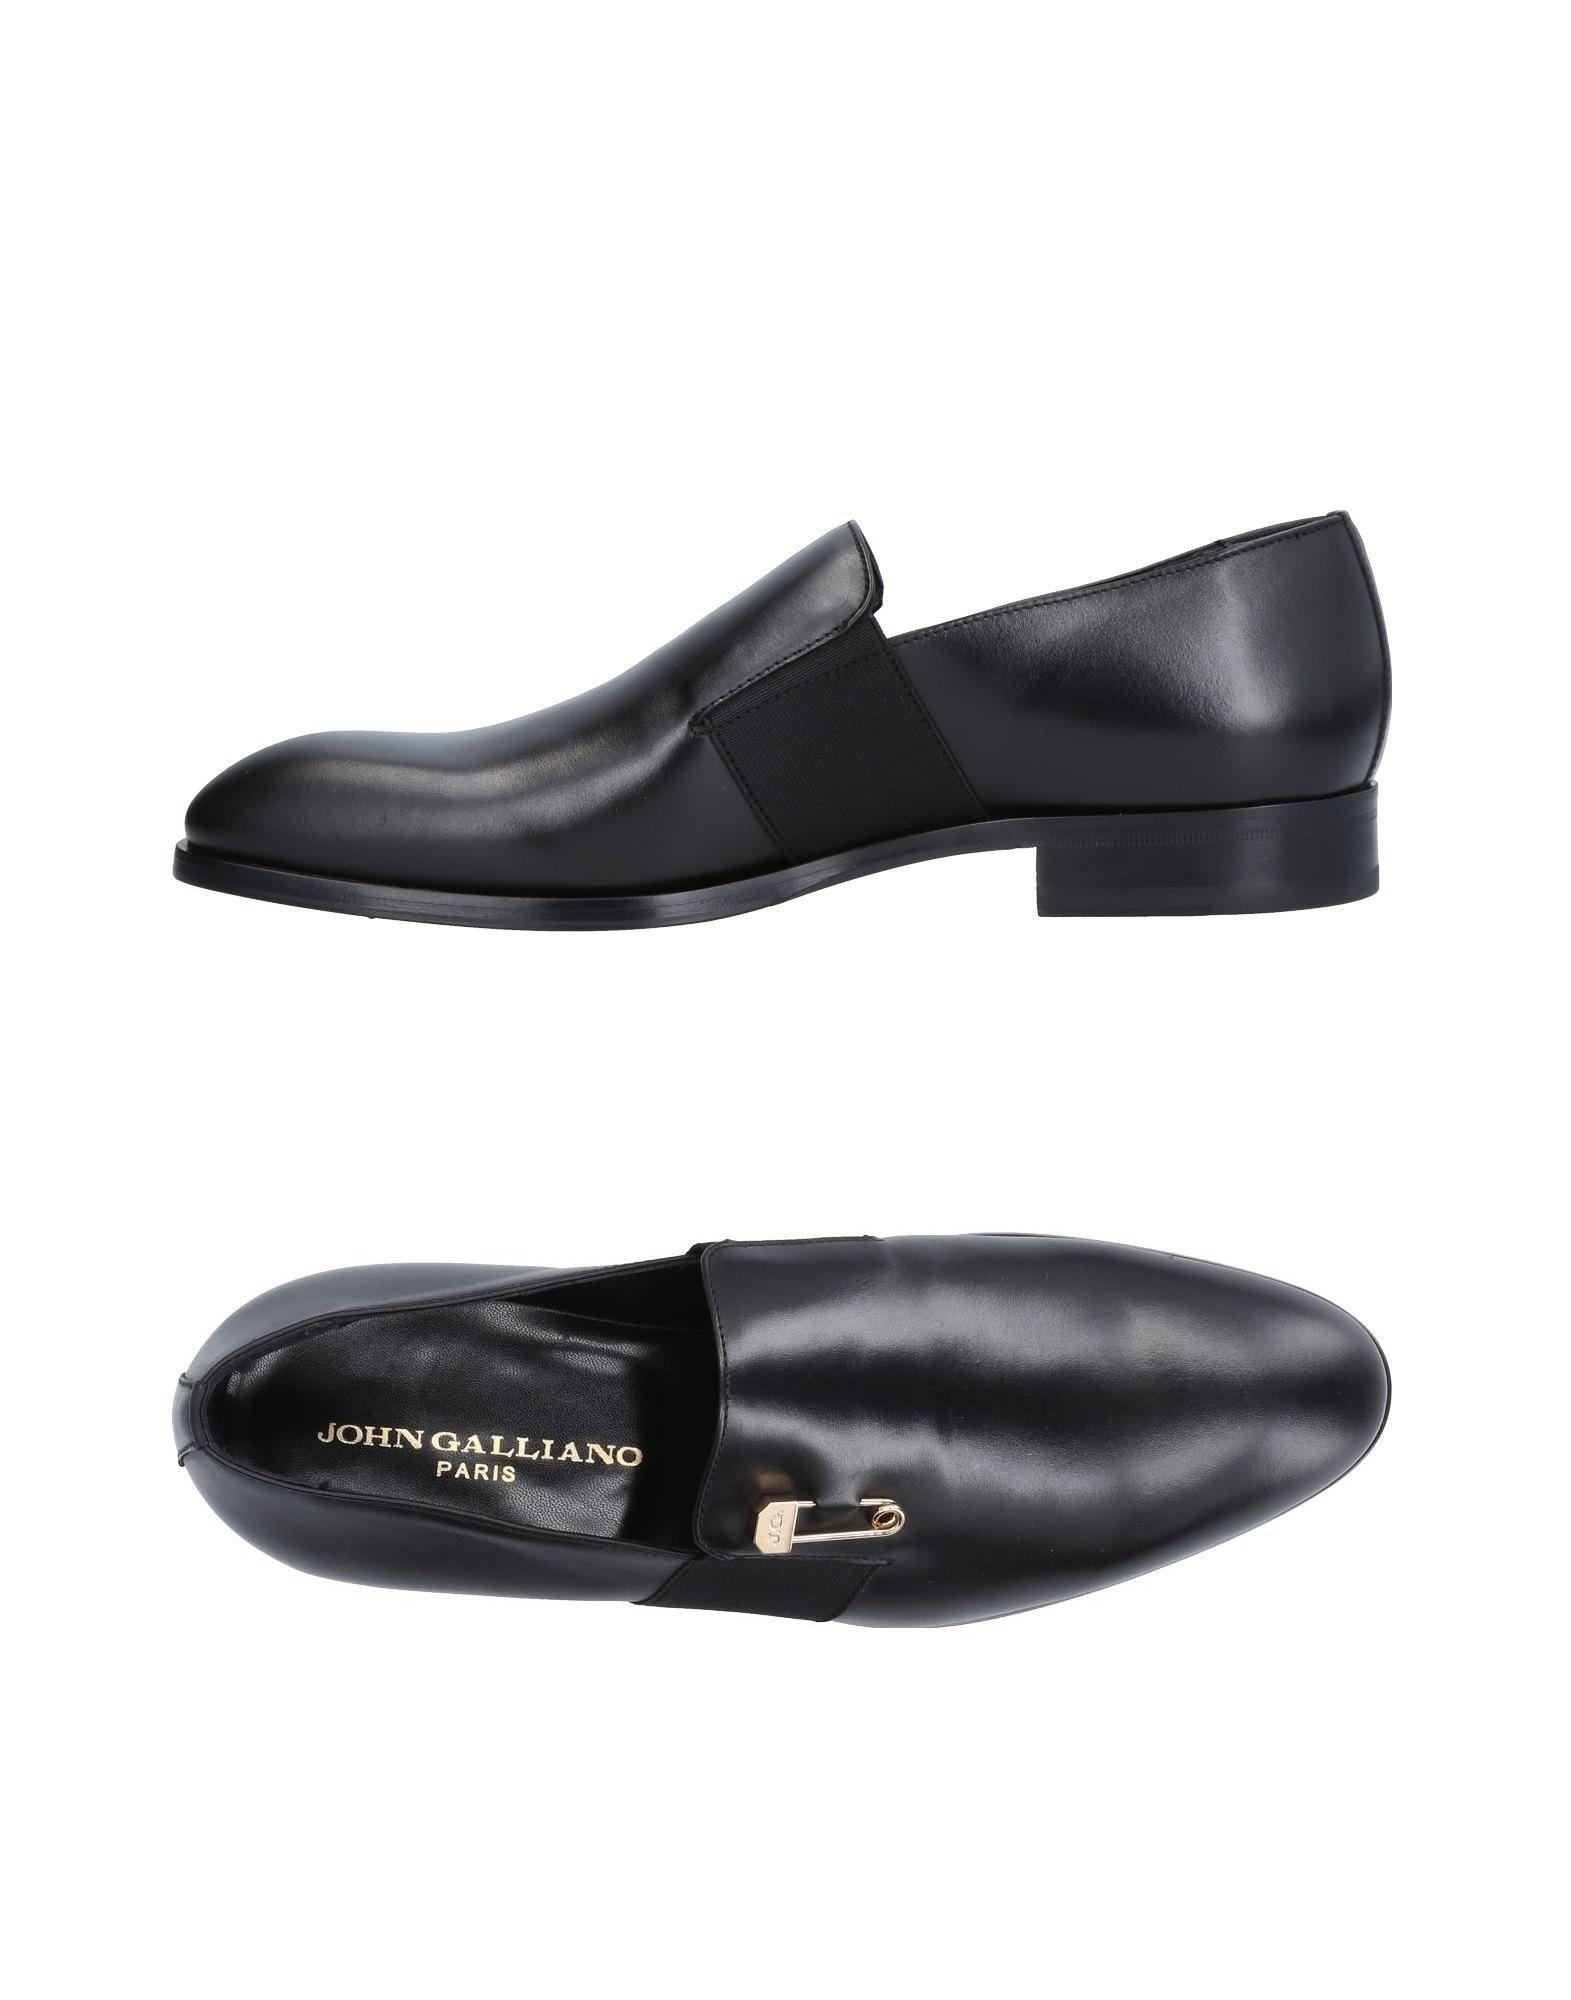 John Galliano Mokassins Herren  11516588KO Gute Qualität beliebte Schuhe